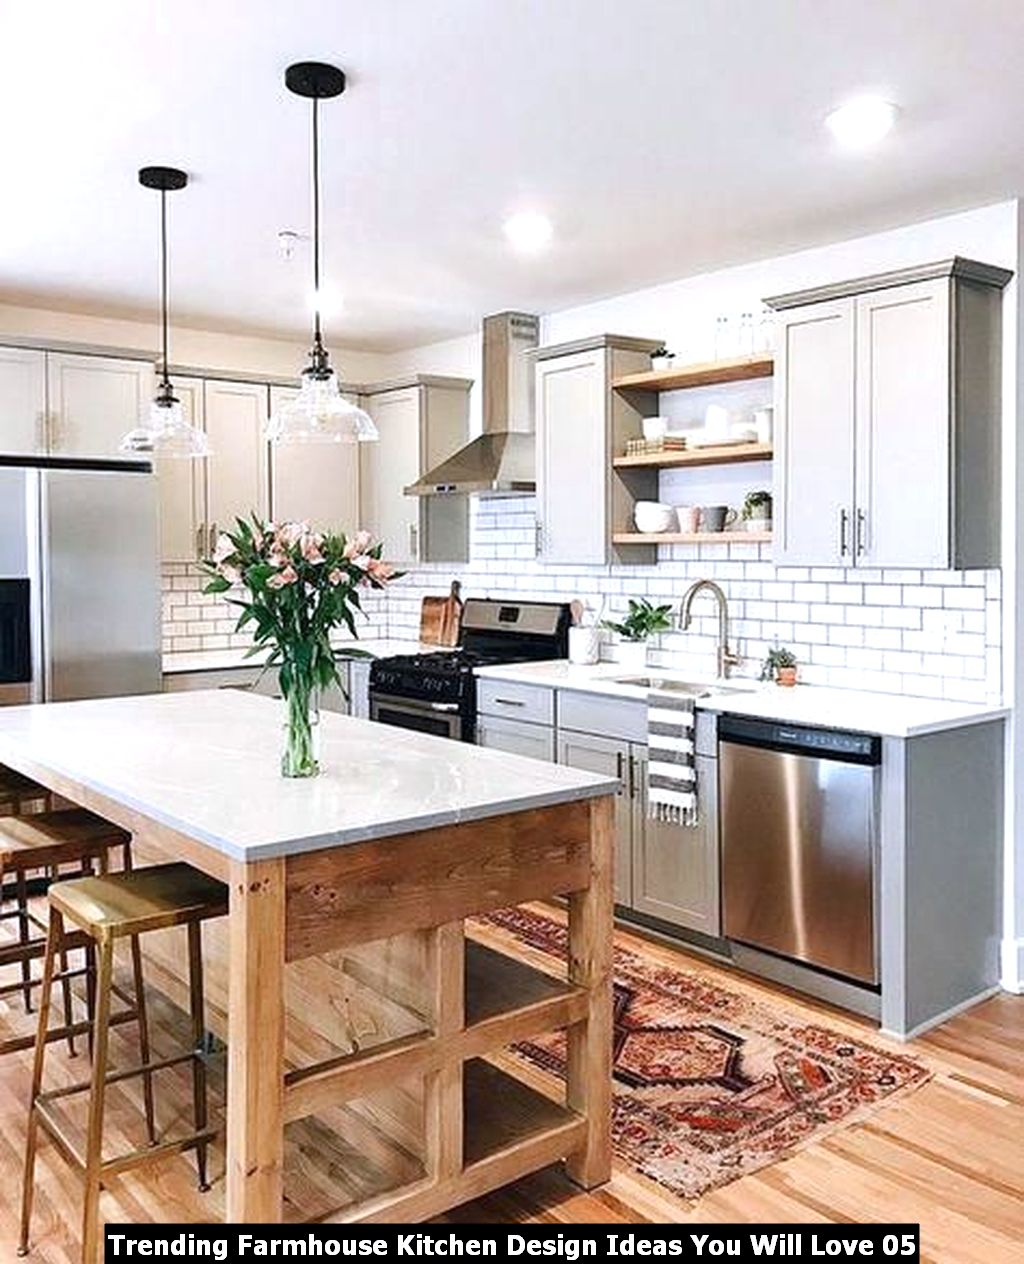 Trending Farmhouse Kitchen Design Ideas You Will Love 05